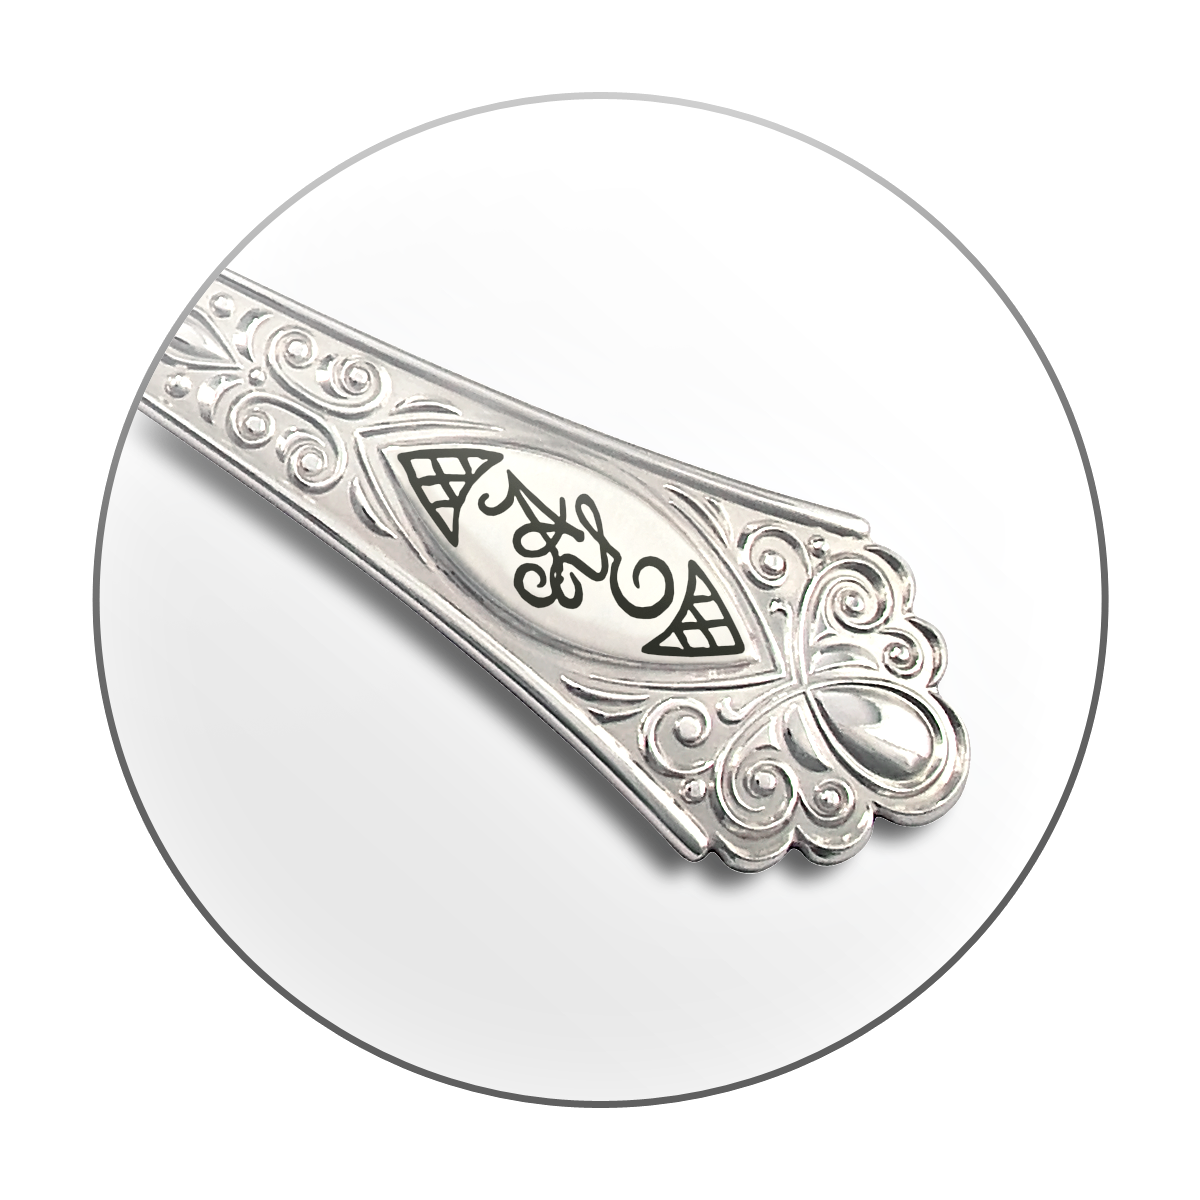 handgravur-von-tafelsilber-familienwappen-monogramm-niello